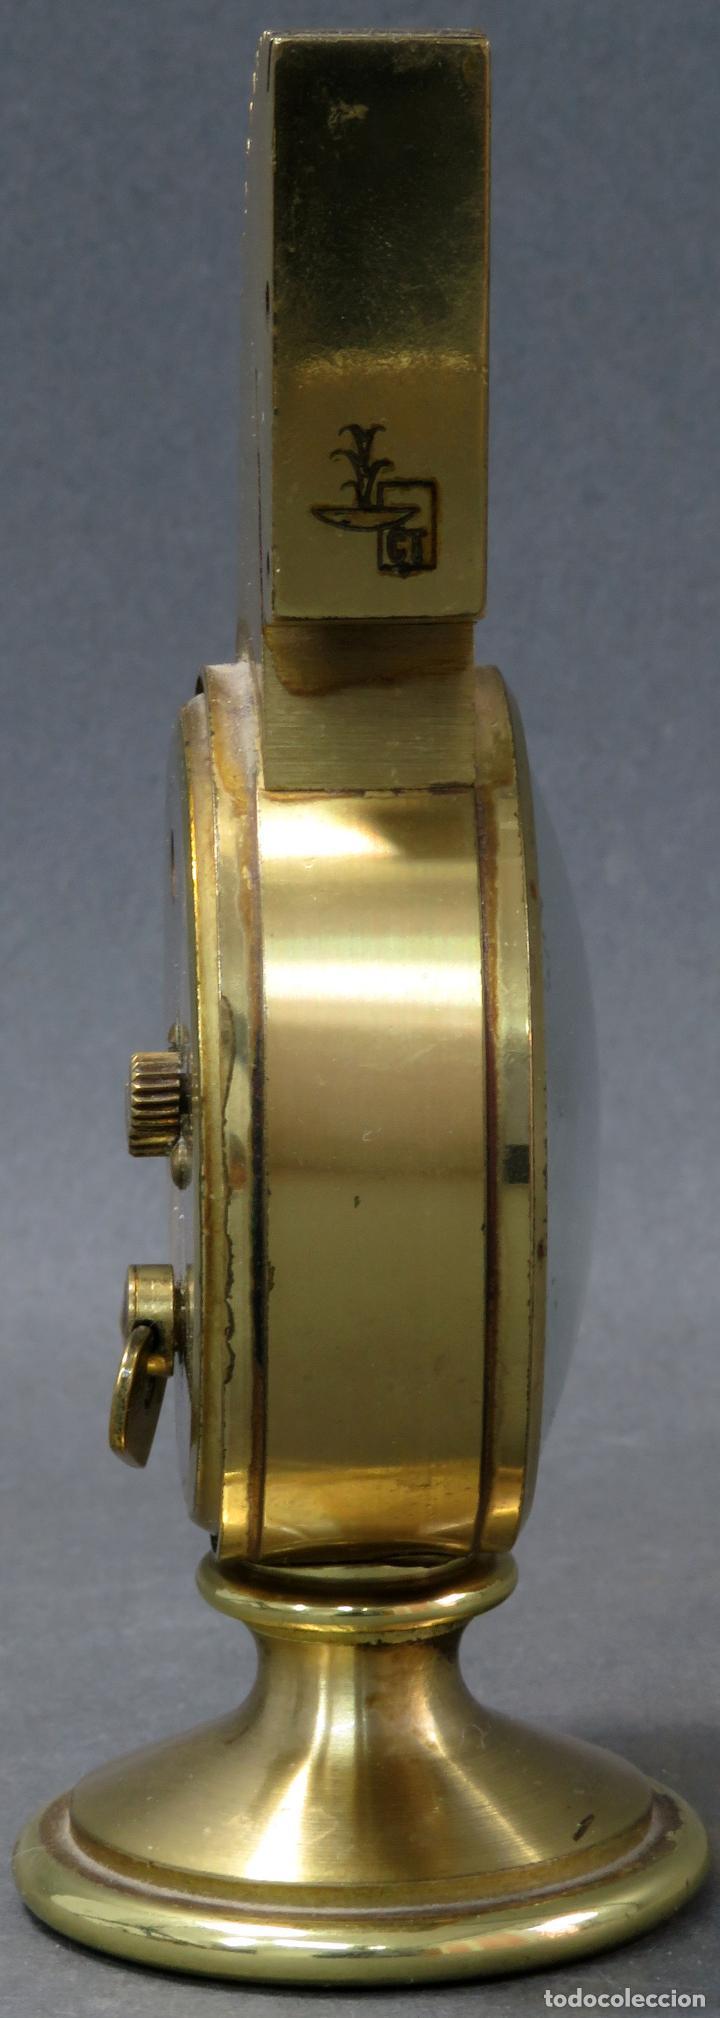 Despertadores antiguos: Reloj despertador bronce forma cabeza caballo Swiza ocho días funcionando años 80 - Foto 6 - 124628555